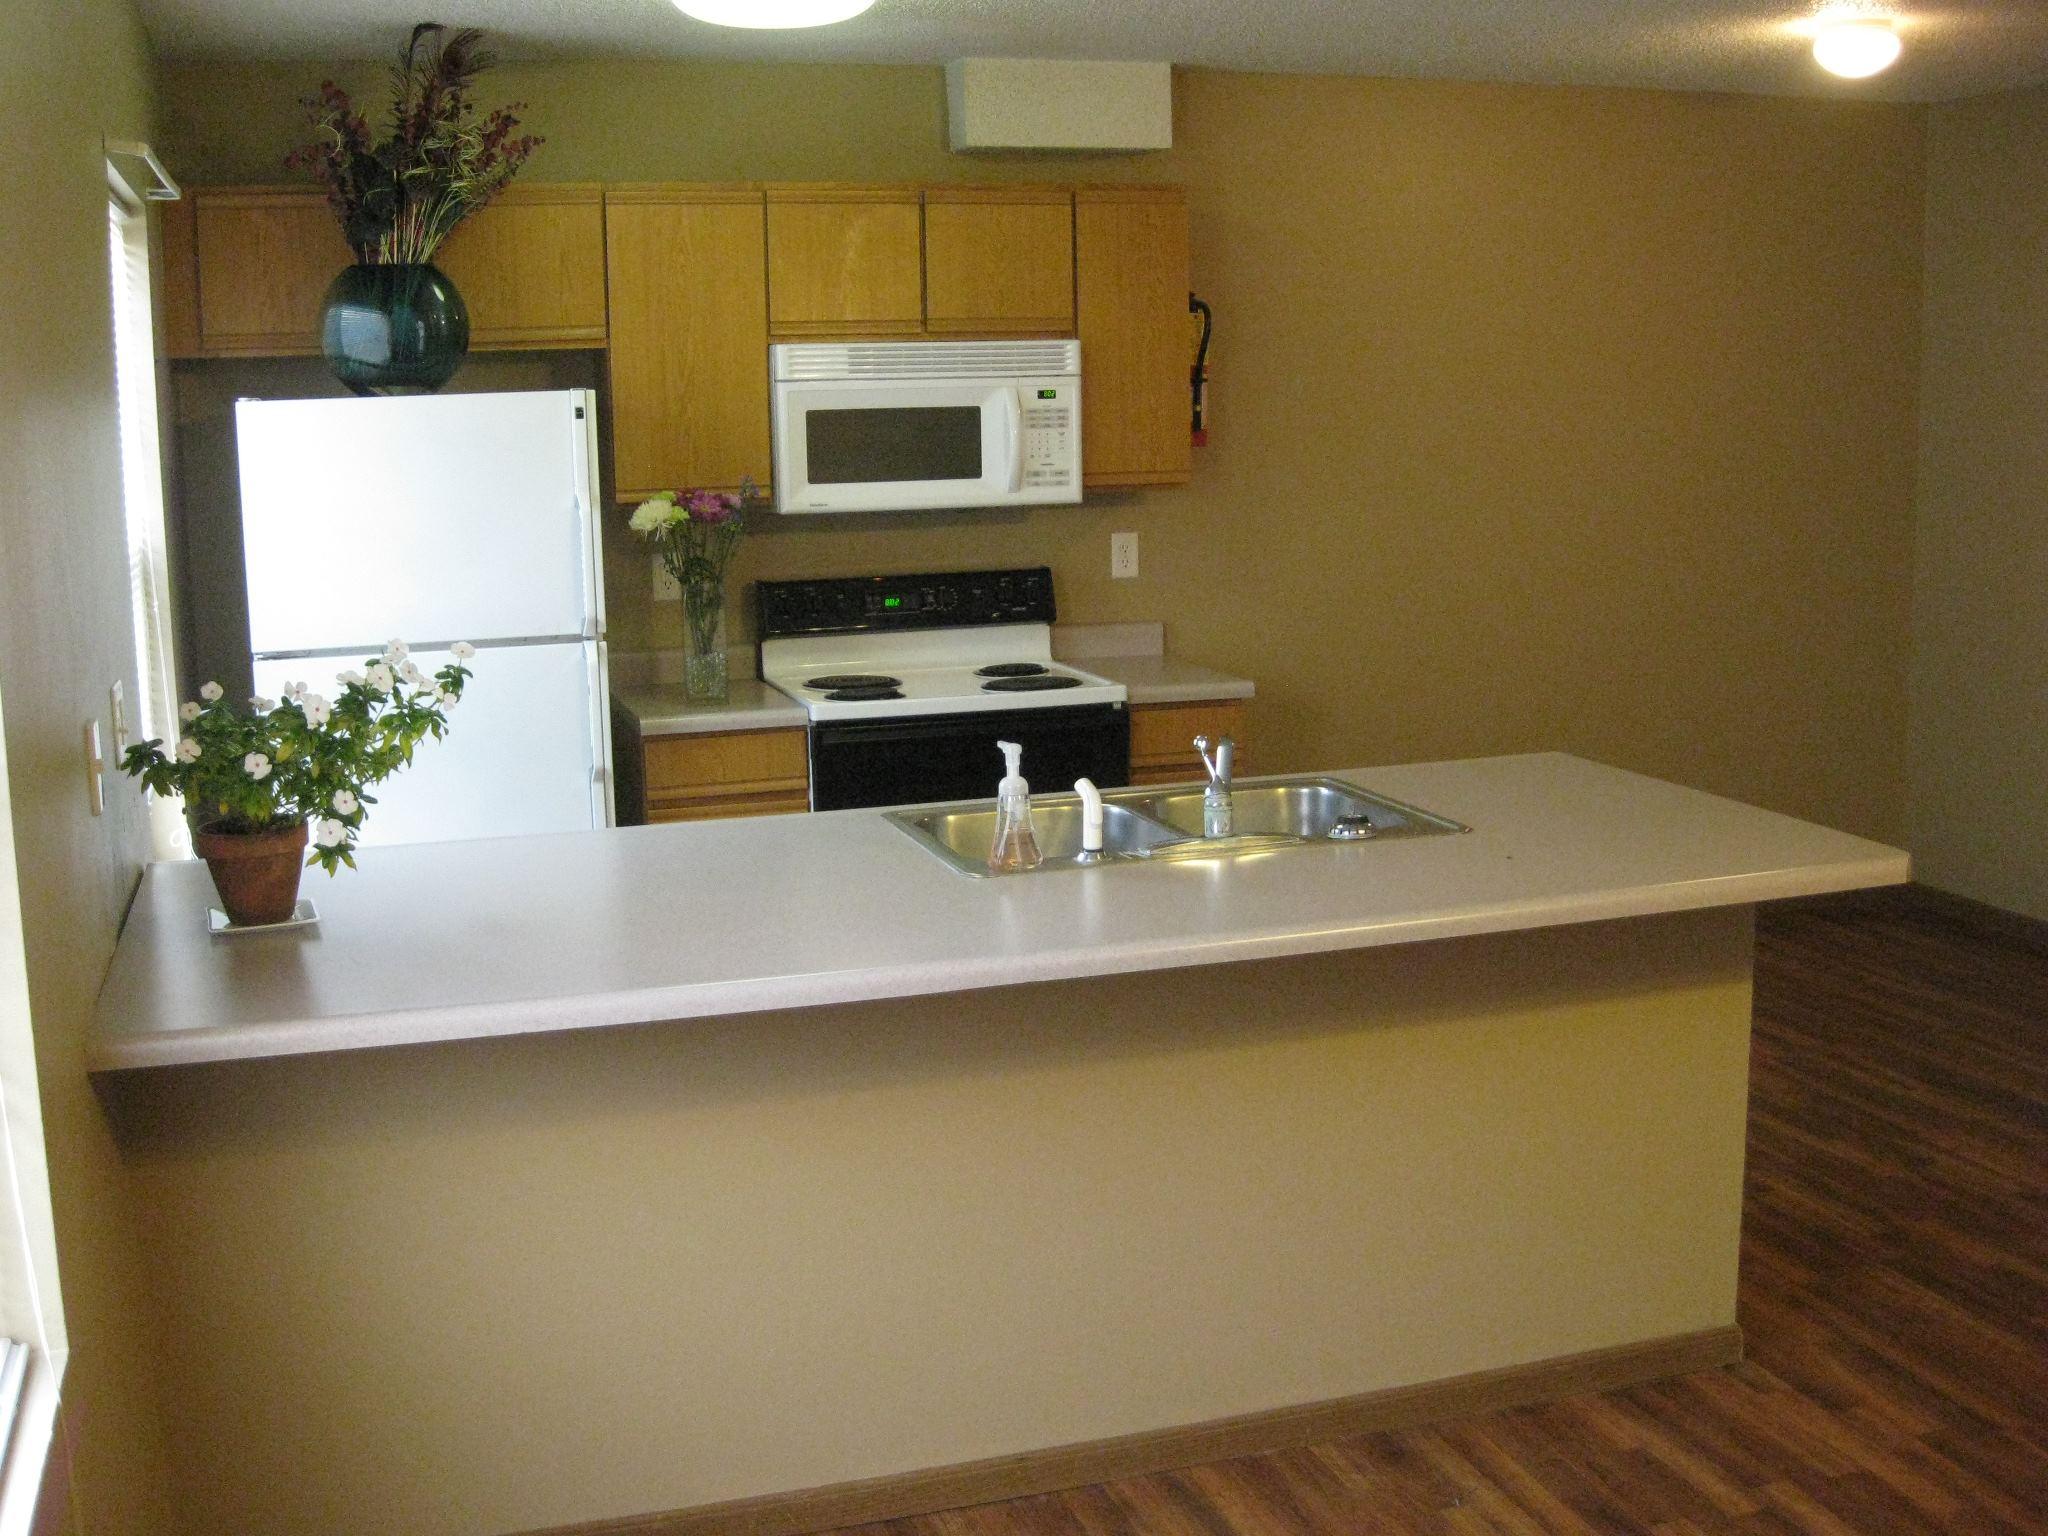 510 5th St A 3 Bed 1 Bath Coralville Kitchen 6